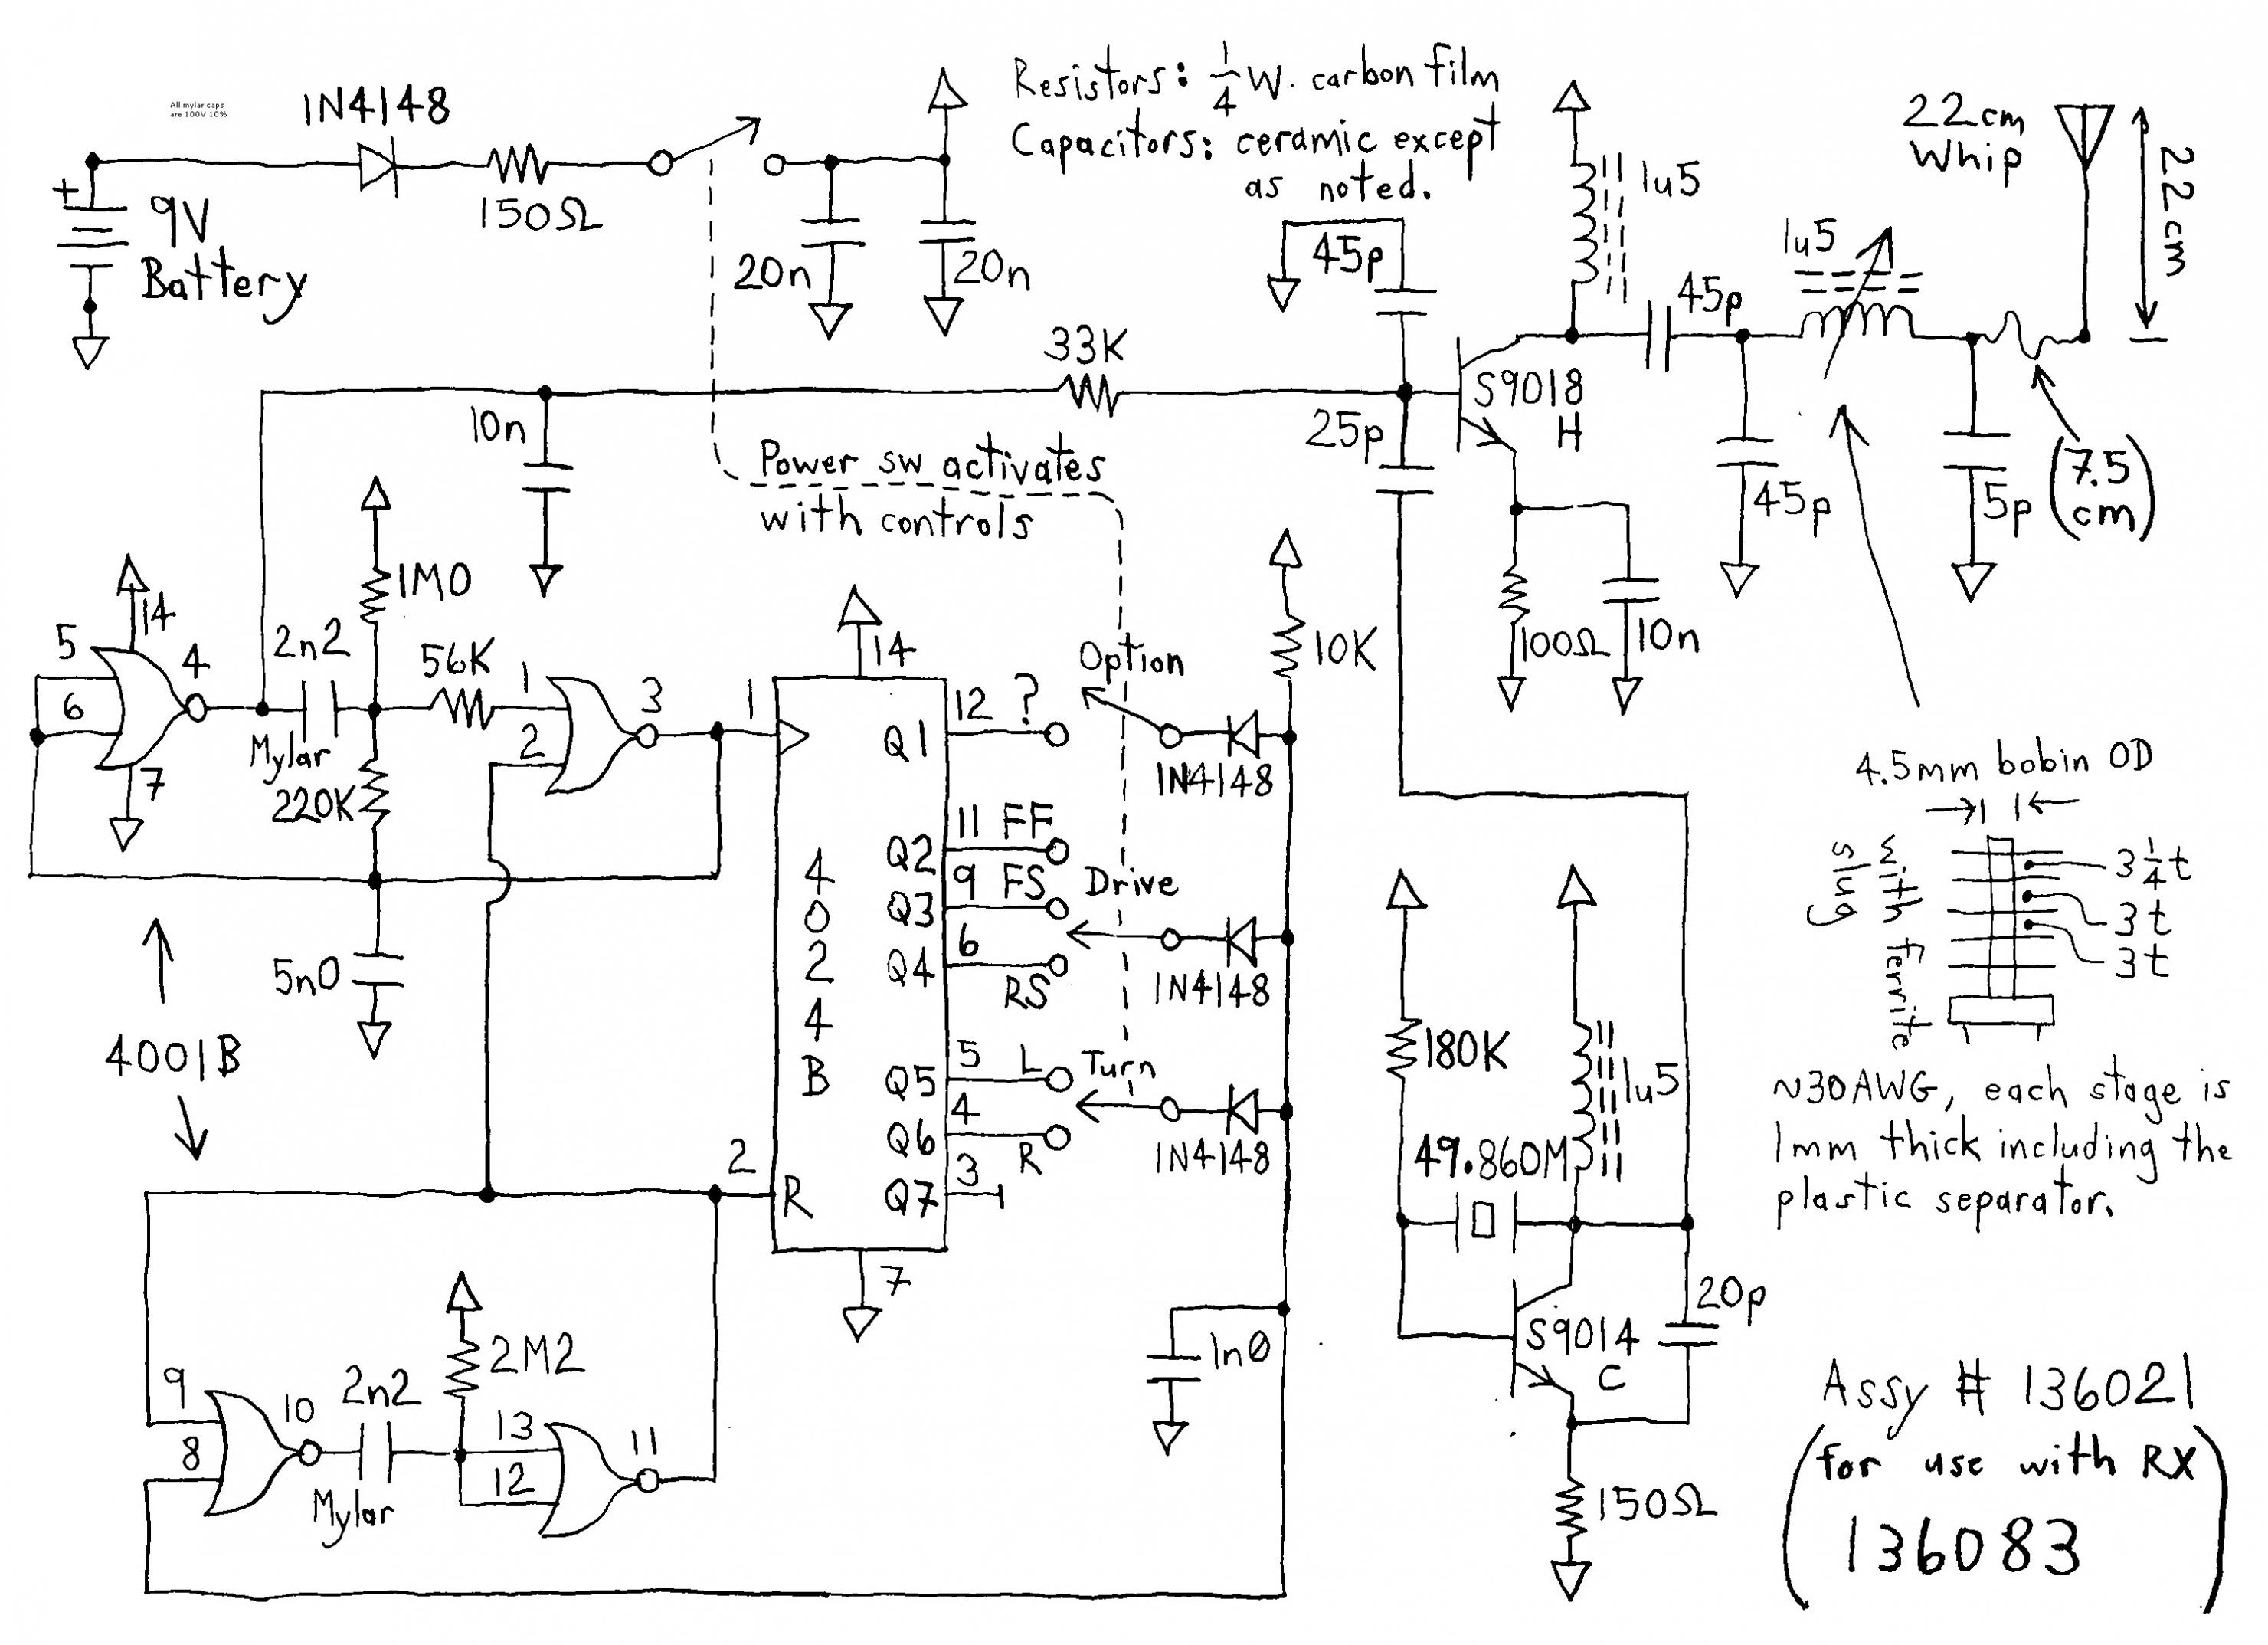 Gibson Sg Wiring Diagram Sources – Sg Wiring Diagram : Daytonva150 - Gibson Sg Wiring Diagram